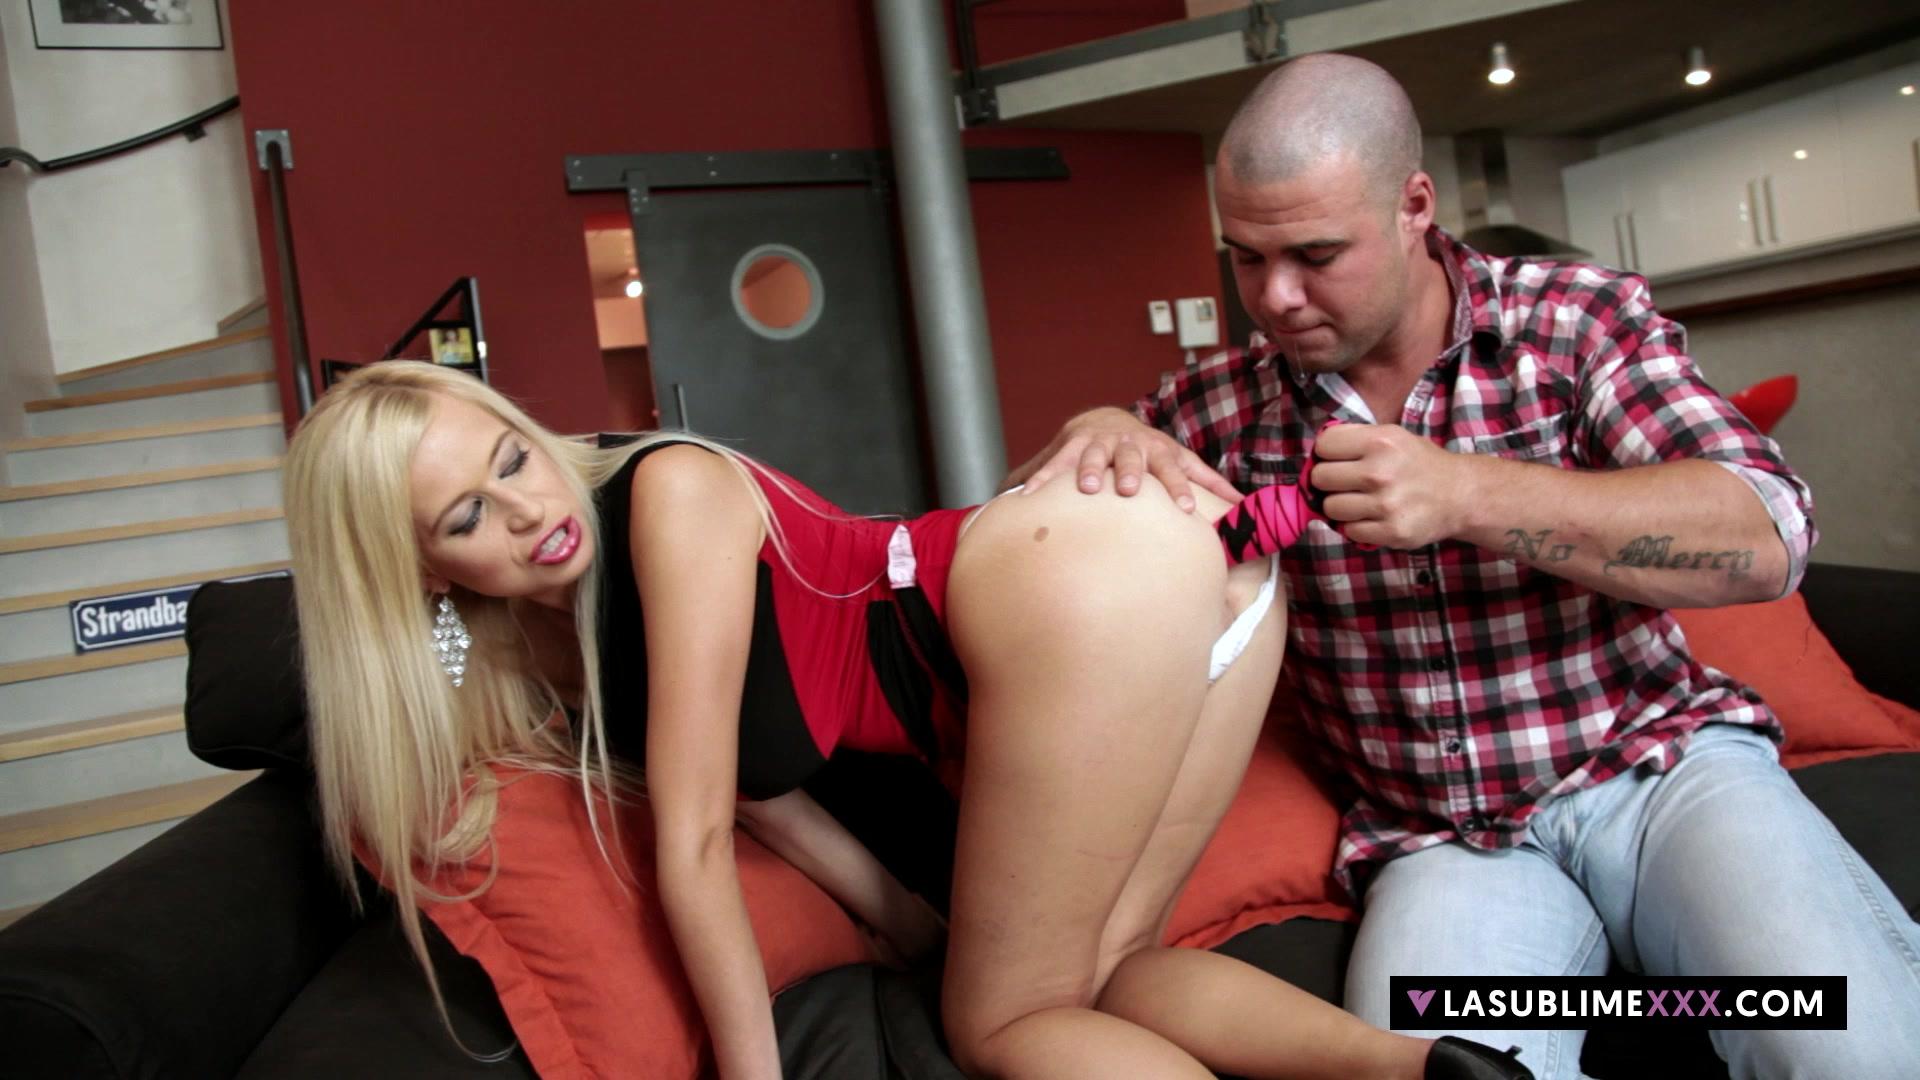 Lasublimexxx Anastasia Devine Will Get Ample Stiffy In Her Bum